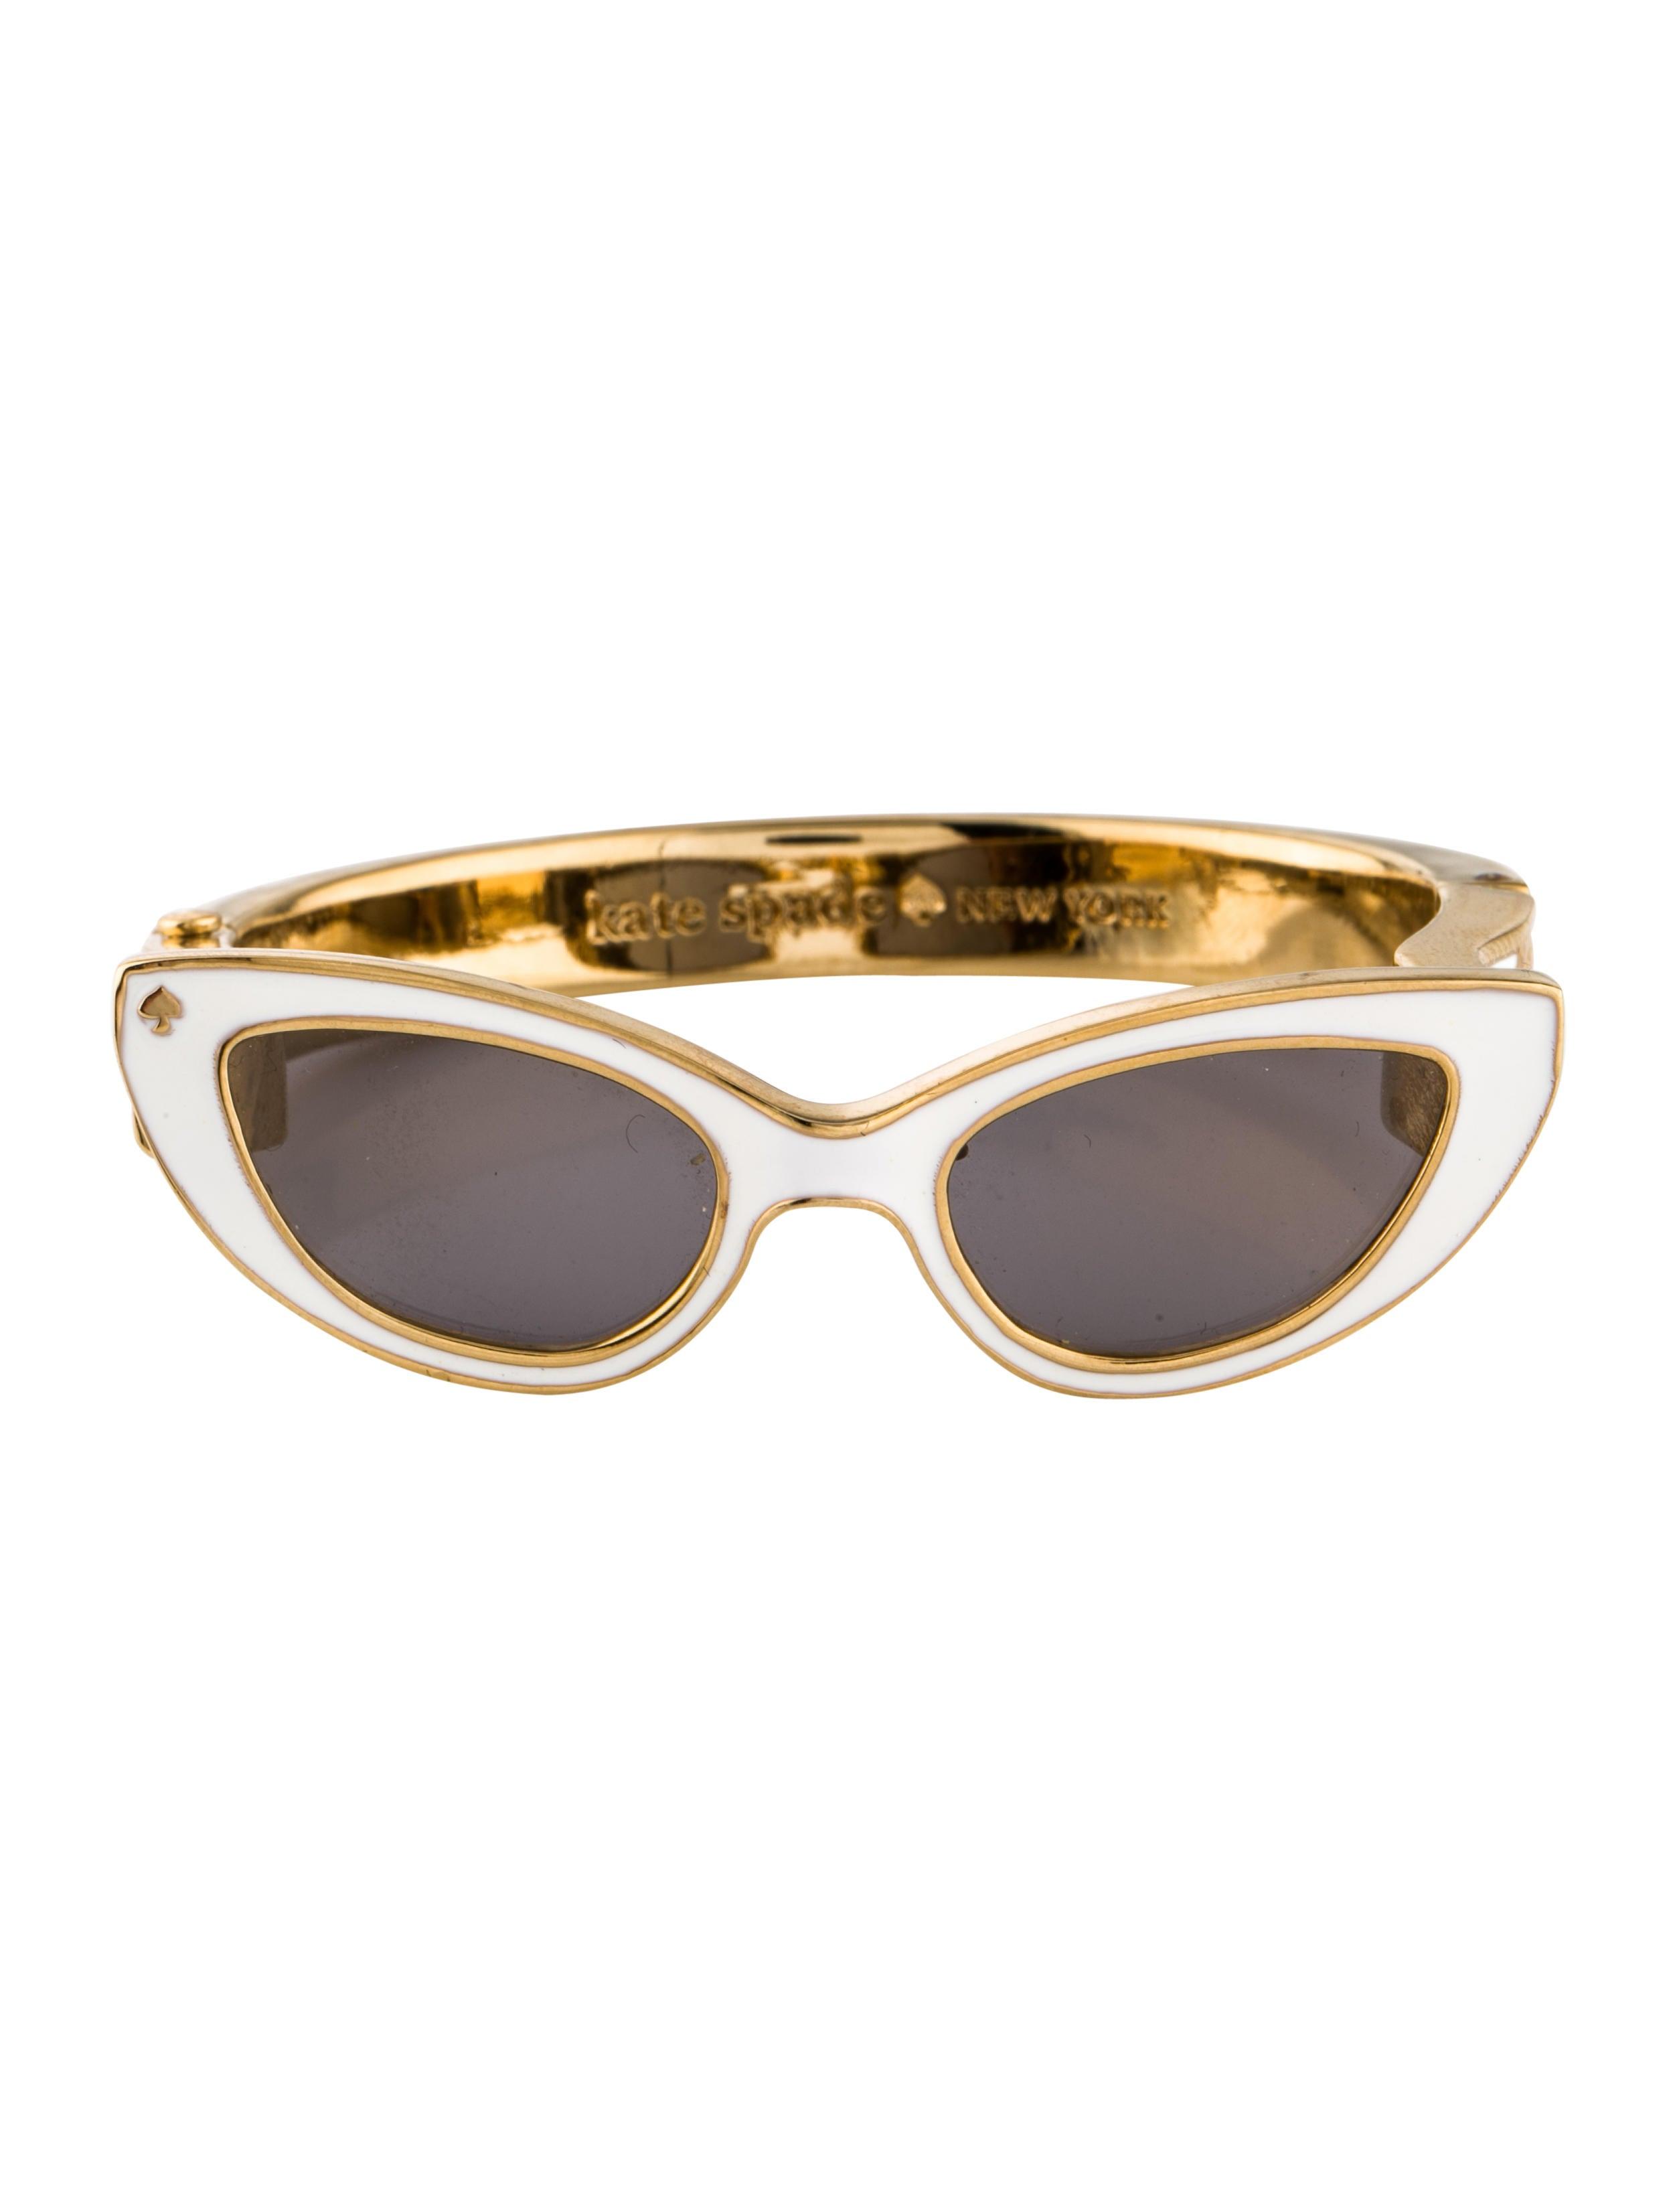 b4804f8db31 Kate Spade New York Enamel Glasses Hinged Bangle - Bracelets ...